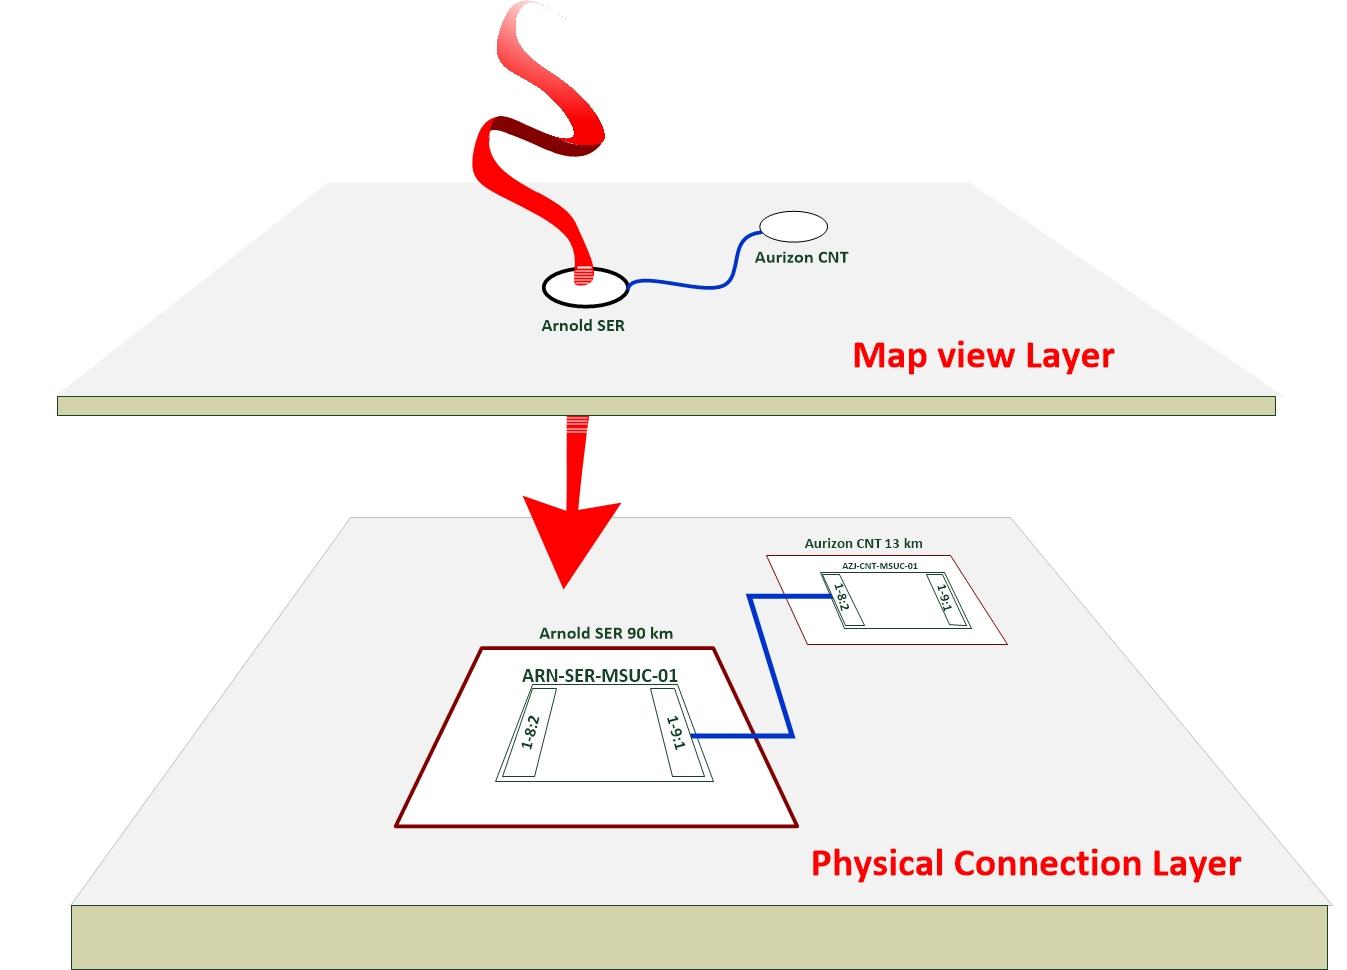 Rail Telecommunication Network Documentation And Modelling Fiber Optics Diagram Its Eprimer Module 9 Fig 1 Graphical Layers Of Model